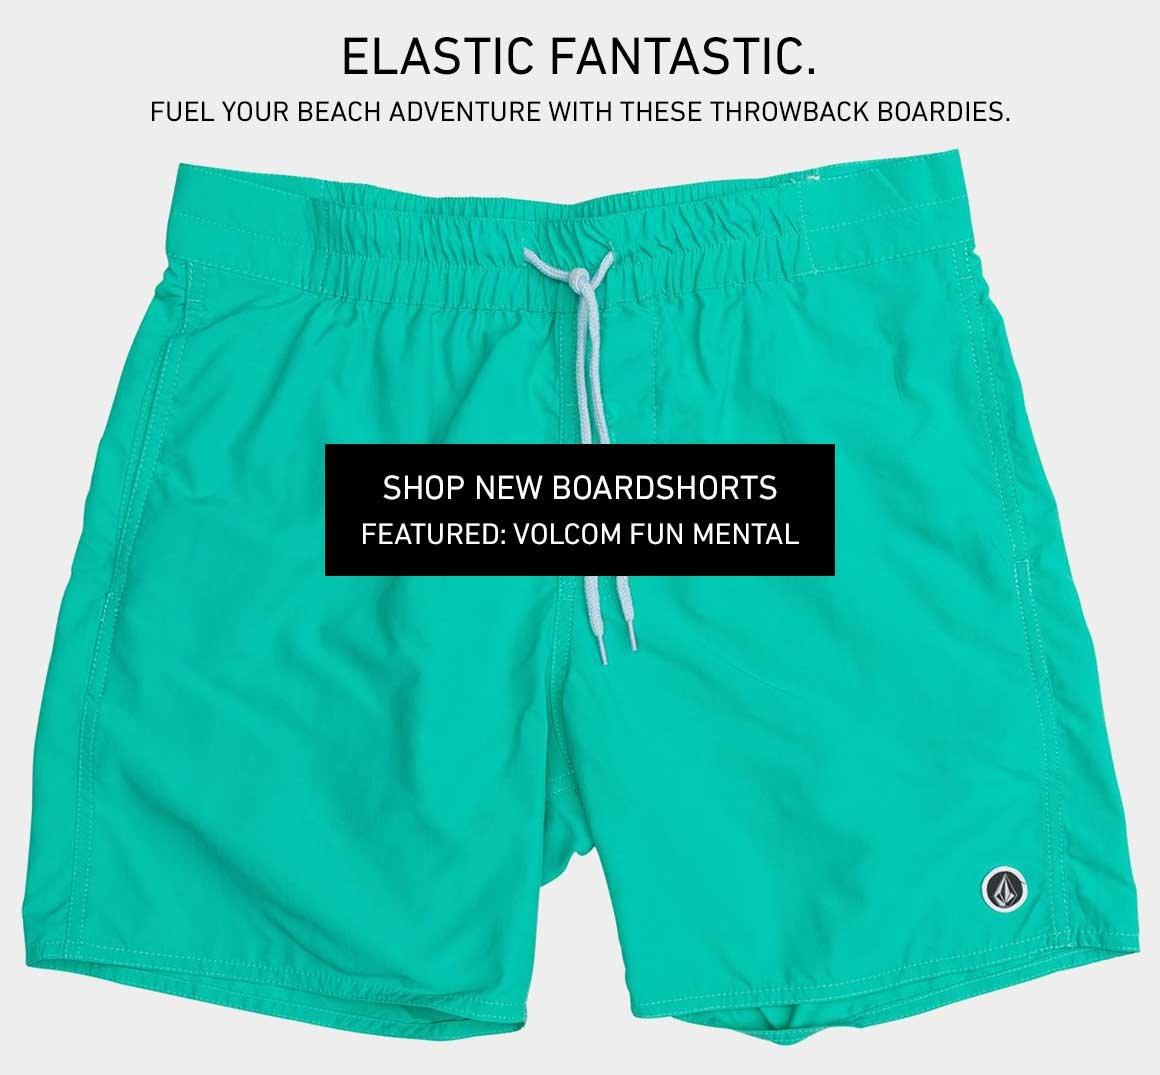 Elastic Fantastic: Shop New Throwback Boardshorts